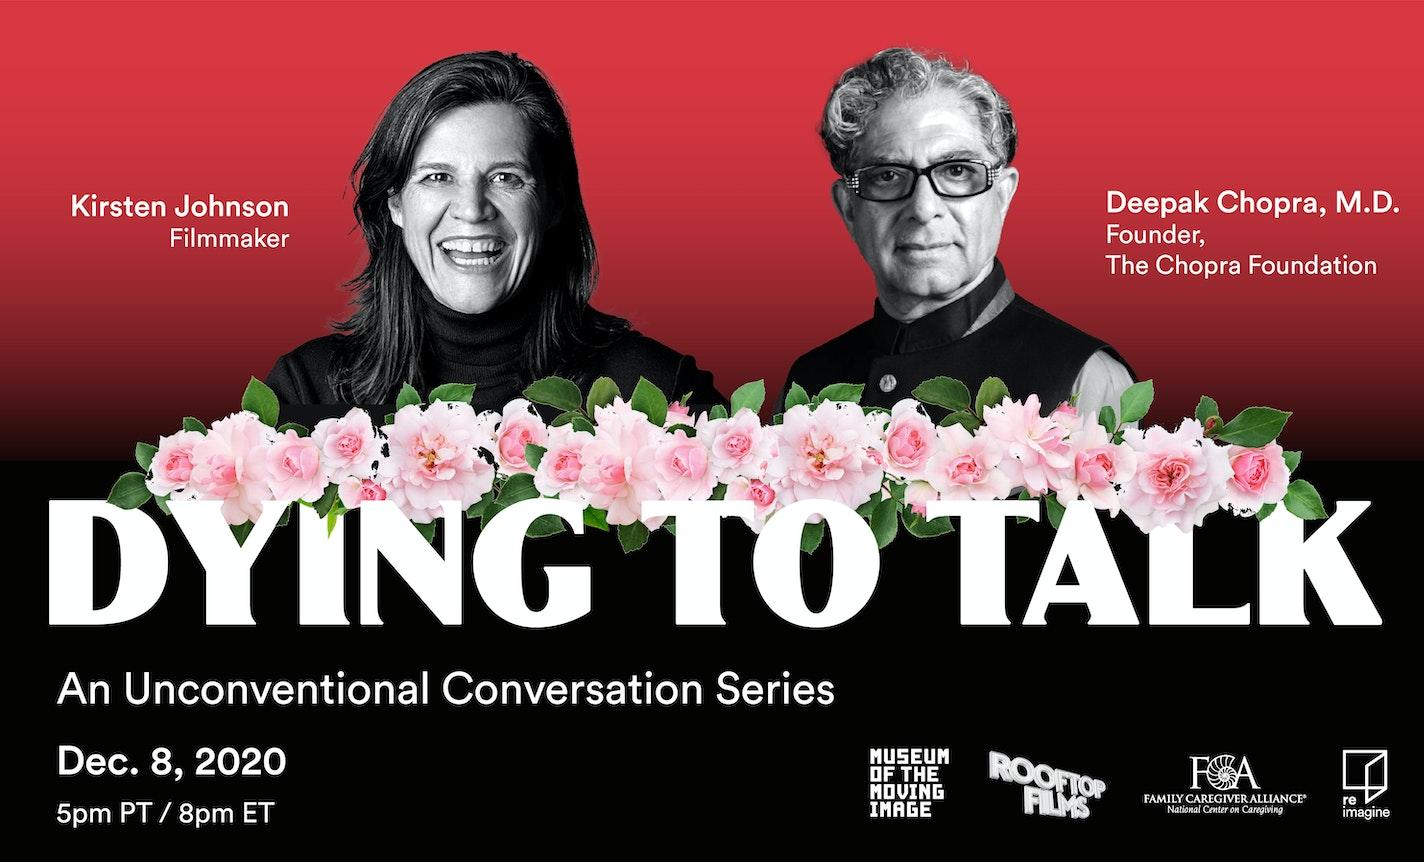 Dying to Talk, Session 3: Deepak Chopra & Kirsten Johnson